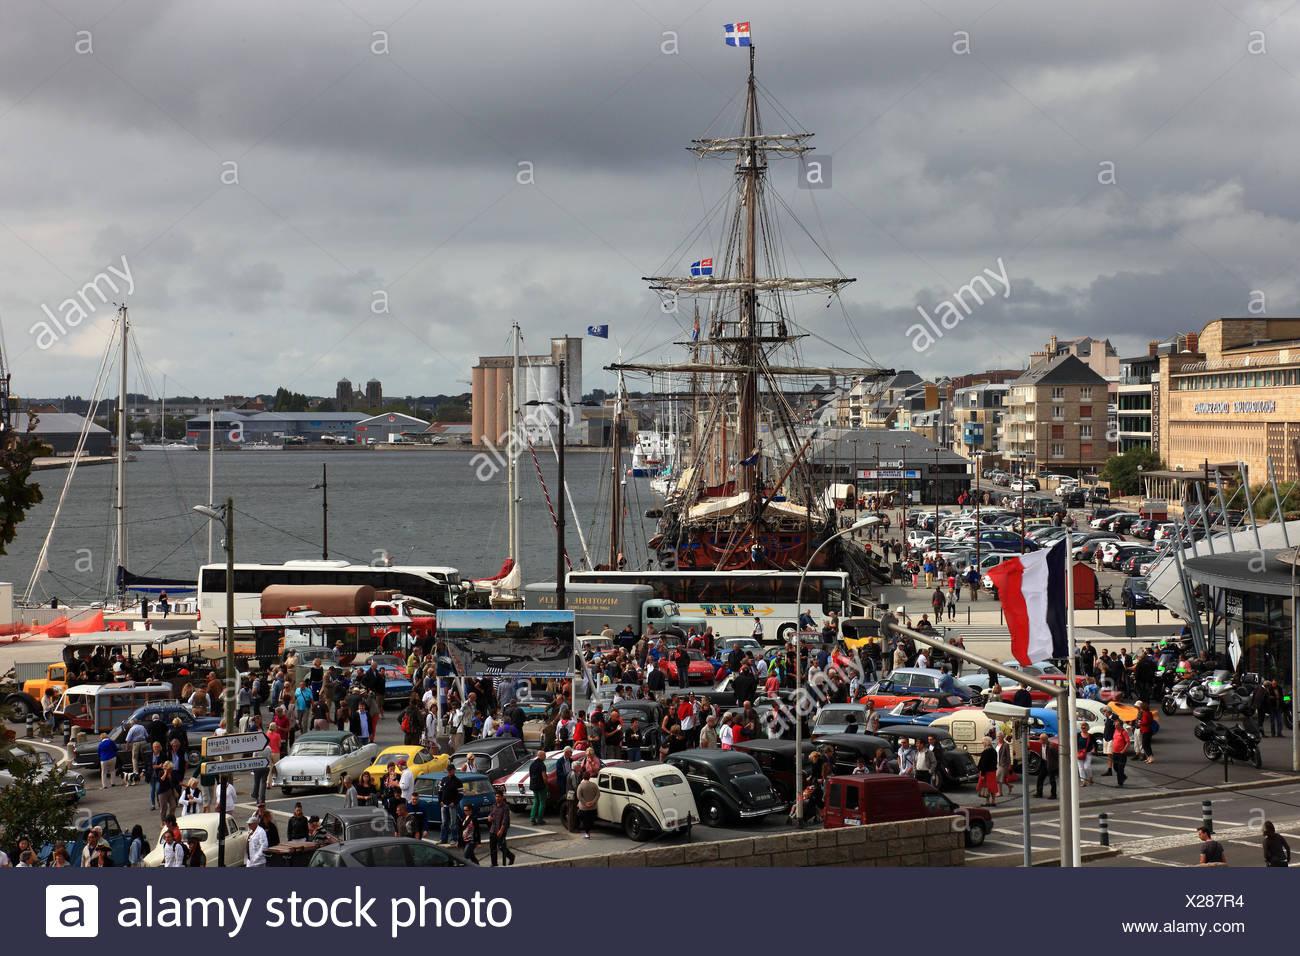 Frankreich, Region Bretagne, Oldtimertreffen im Jachthafen von Saint Malo Stock Photo